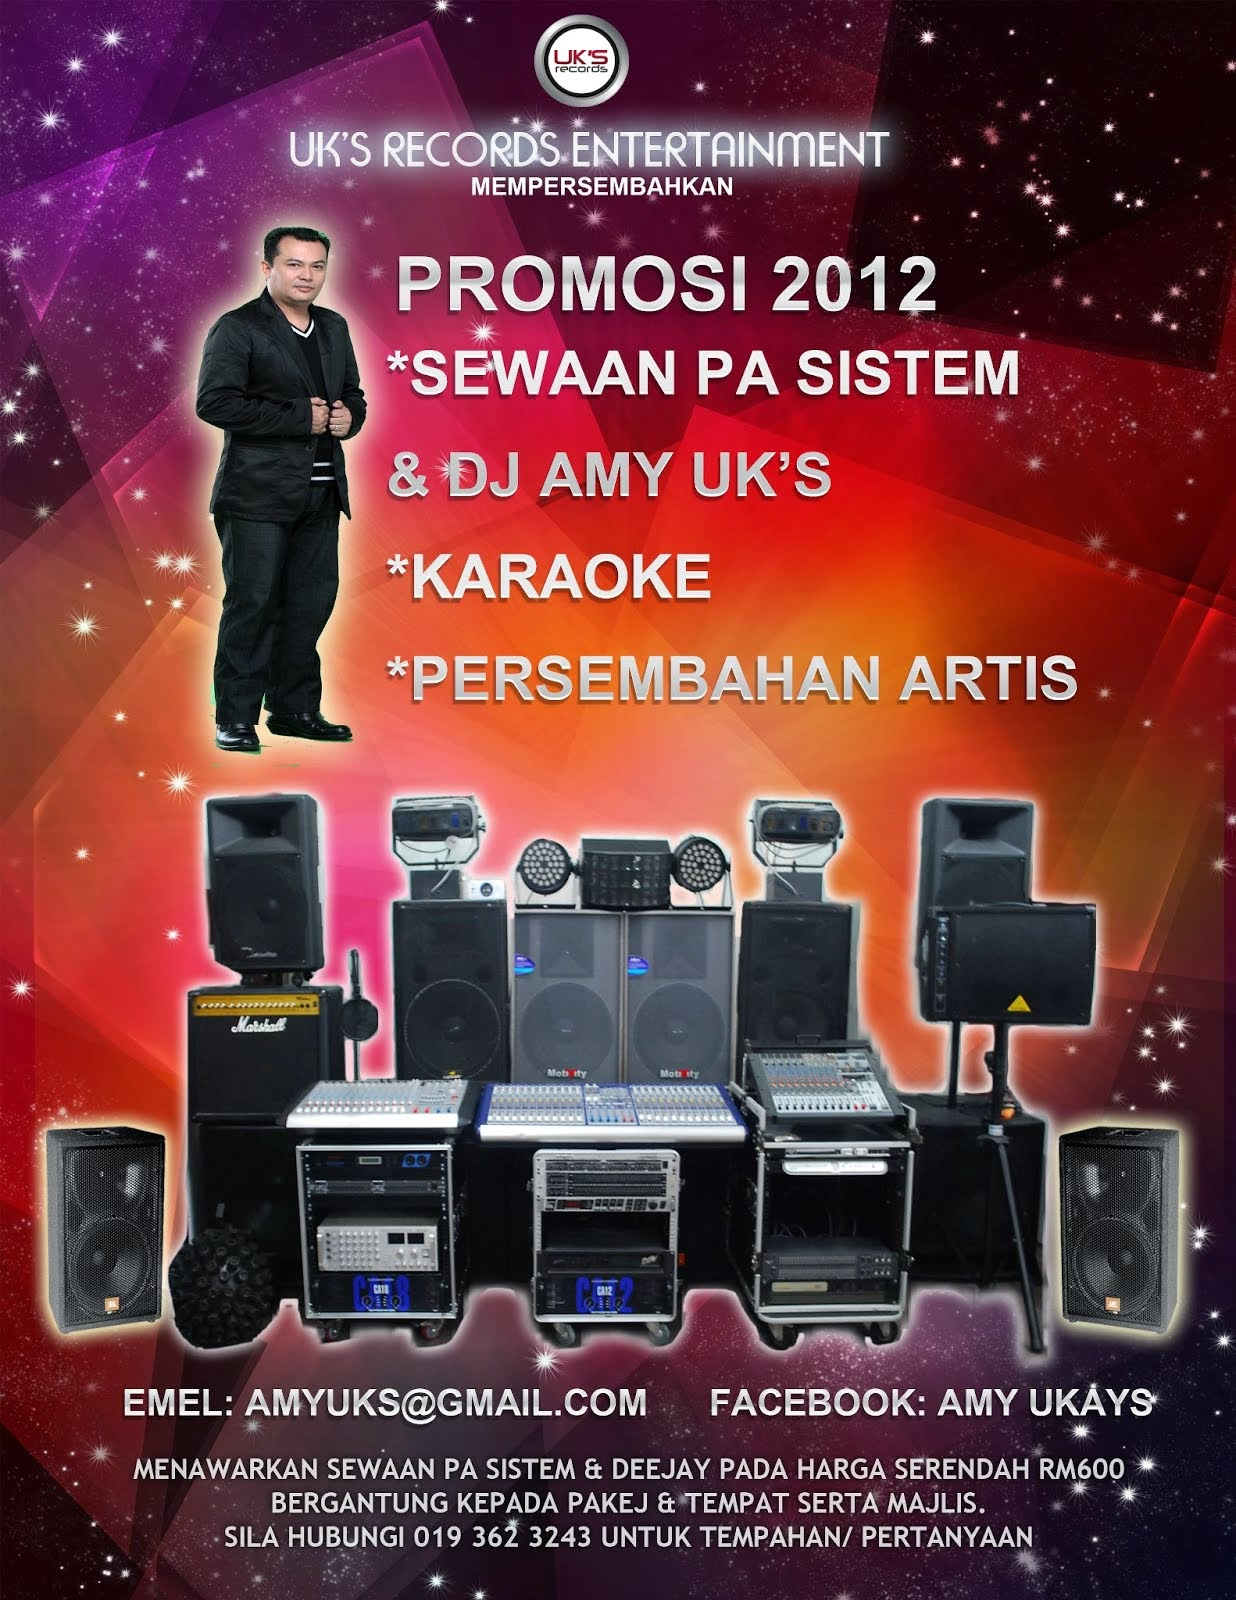 Sewaan Pa sistem & DJ